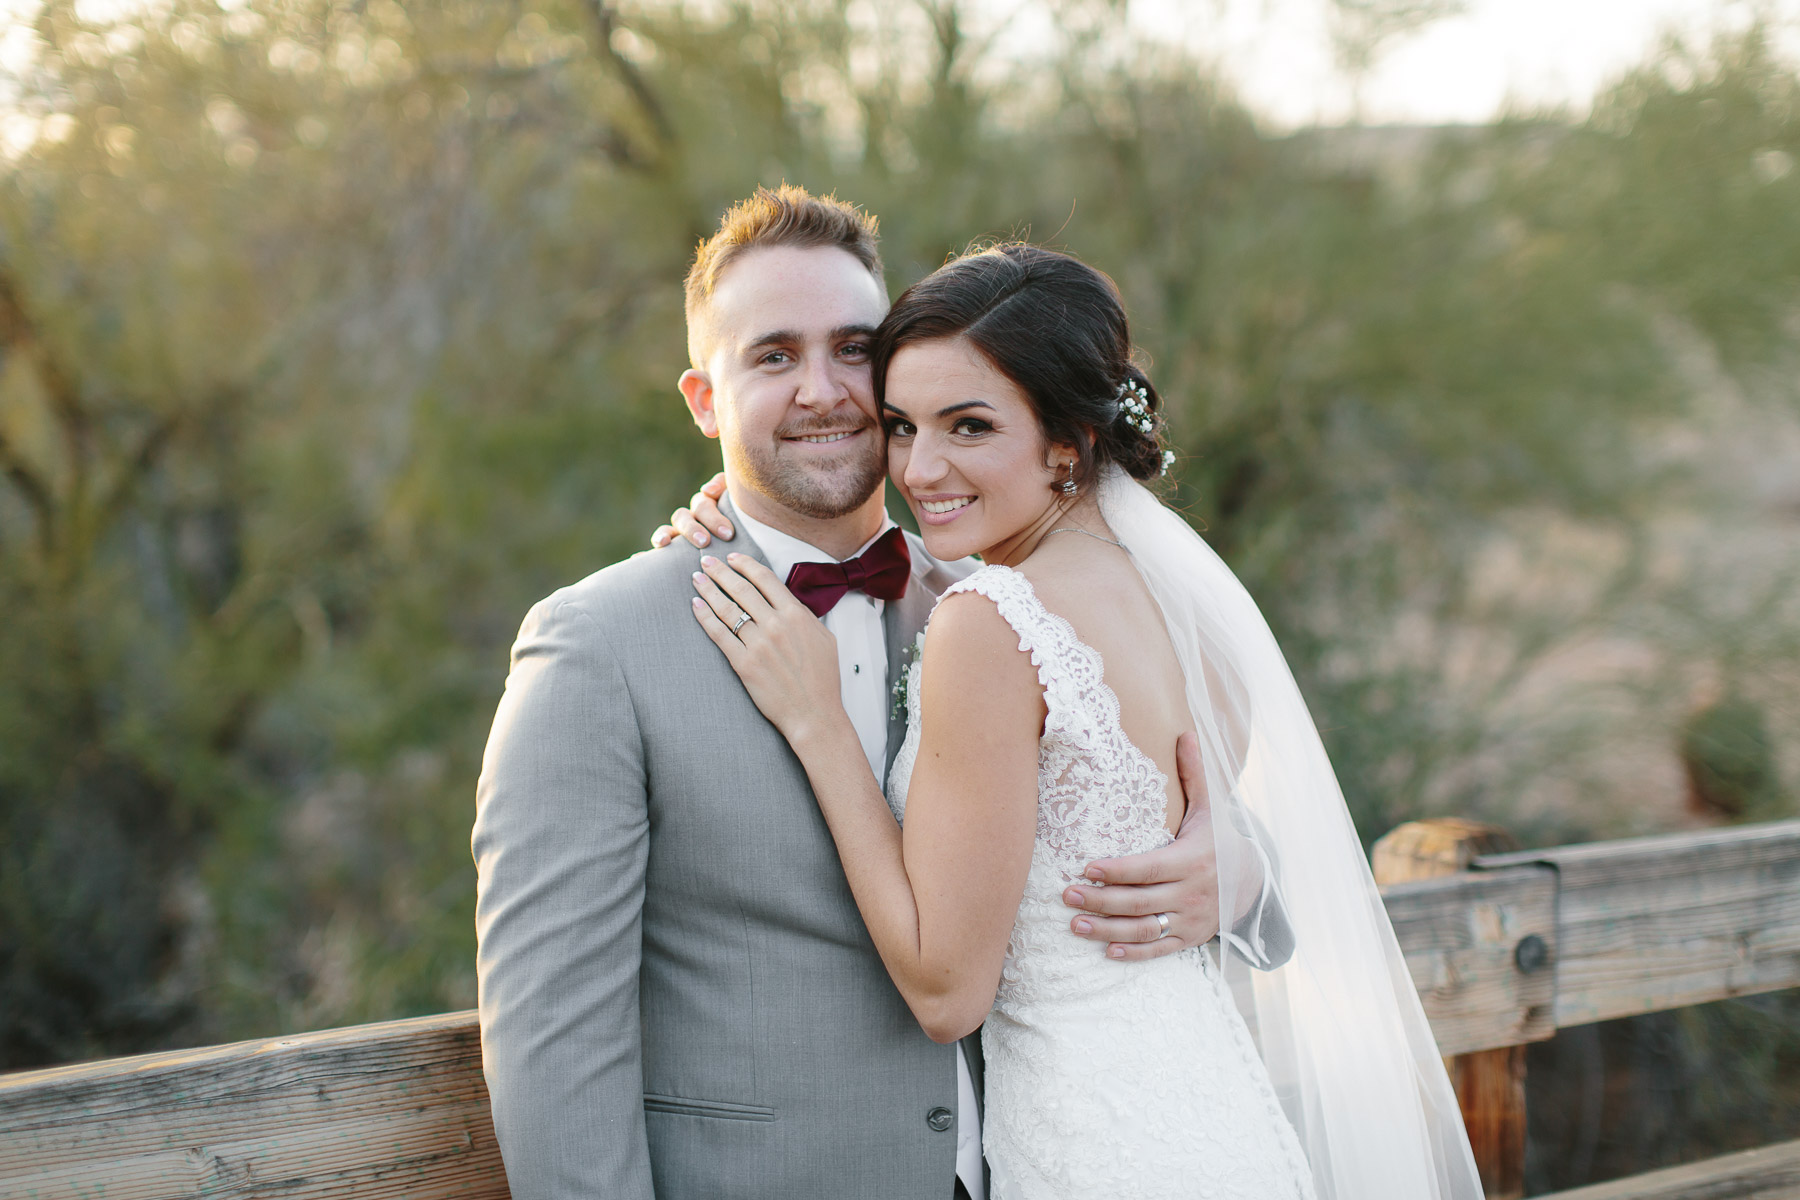 161210-Luxium-Weddings-Arizona-Matt-Jenny-Anthem-Golf-Country-Club-1053.jpg